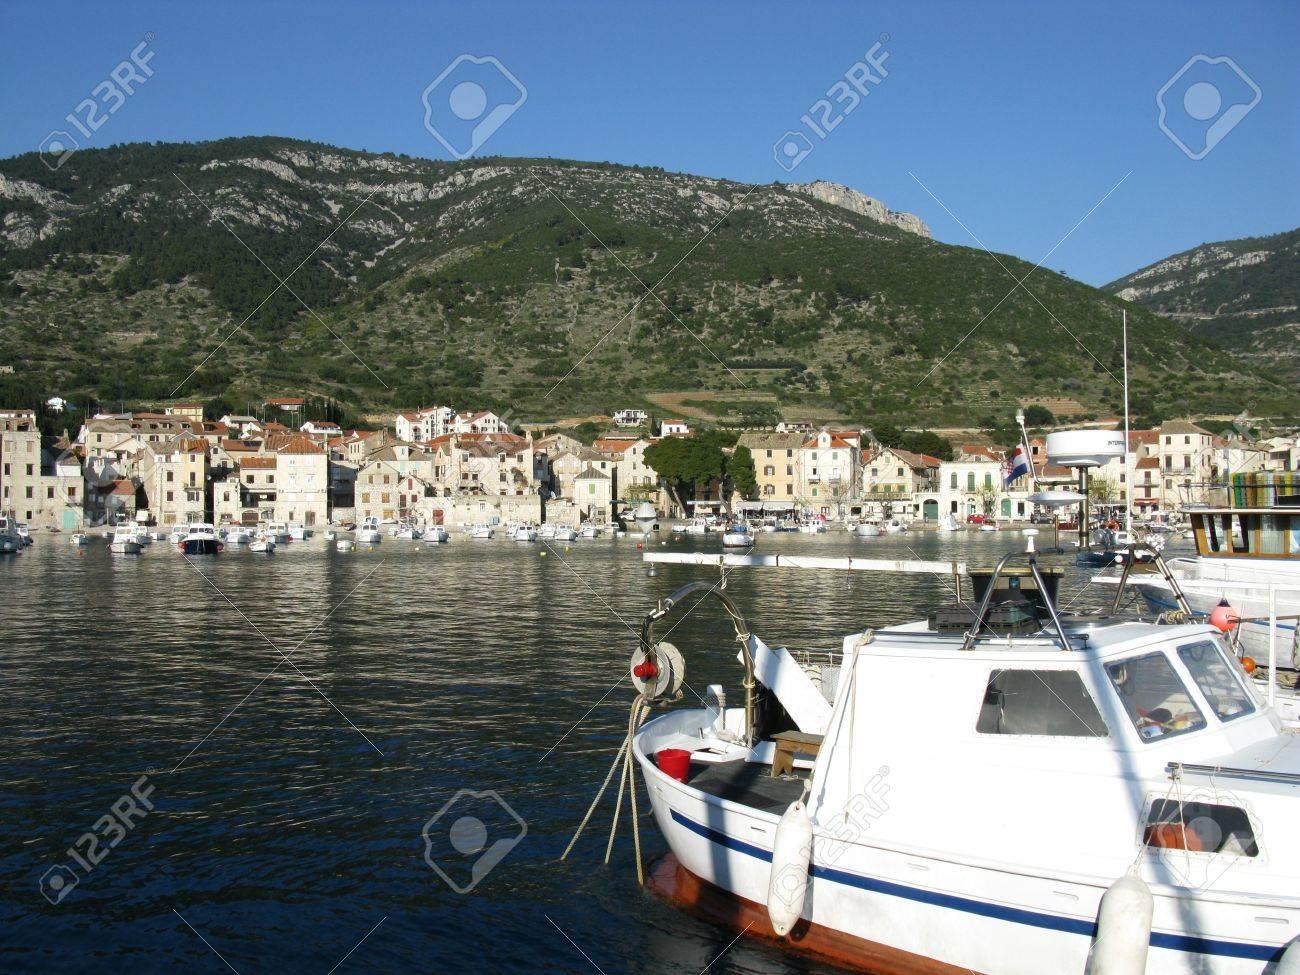 Komiza a city on the island Vis in Croatia in the Adriatic sea Stock Photo - 17134855